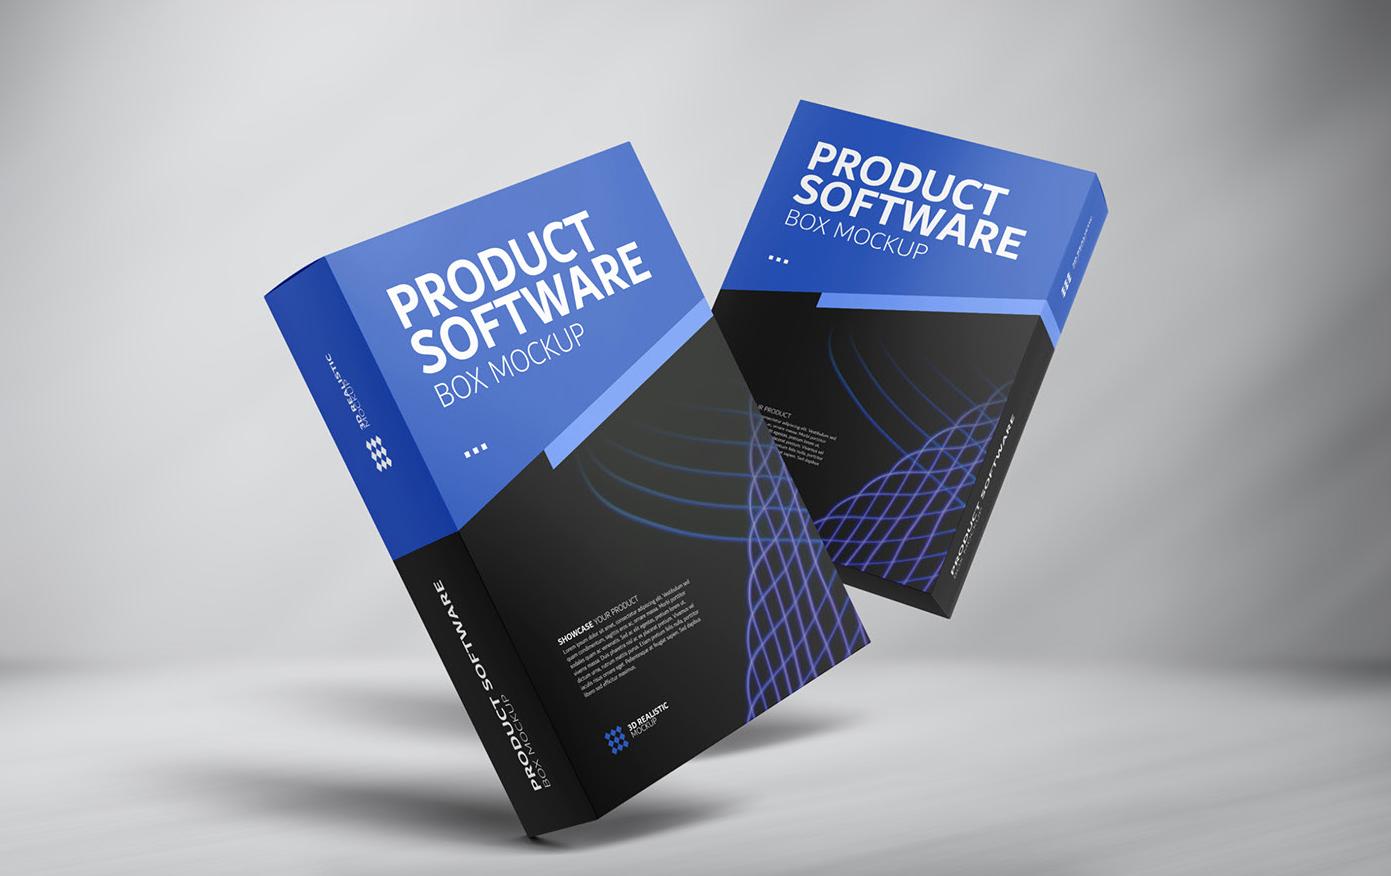 Product Software Box Packaging Free Mockup